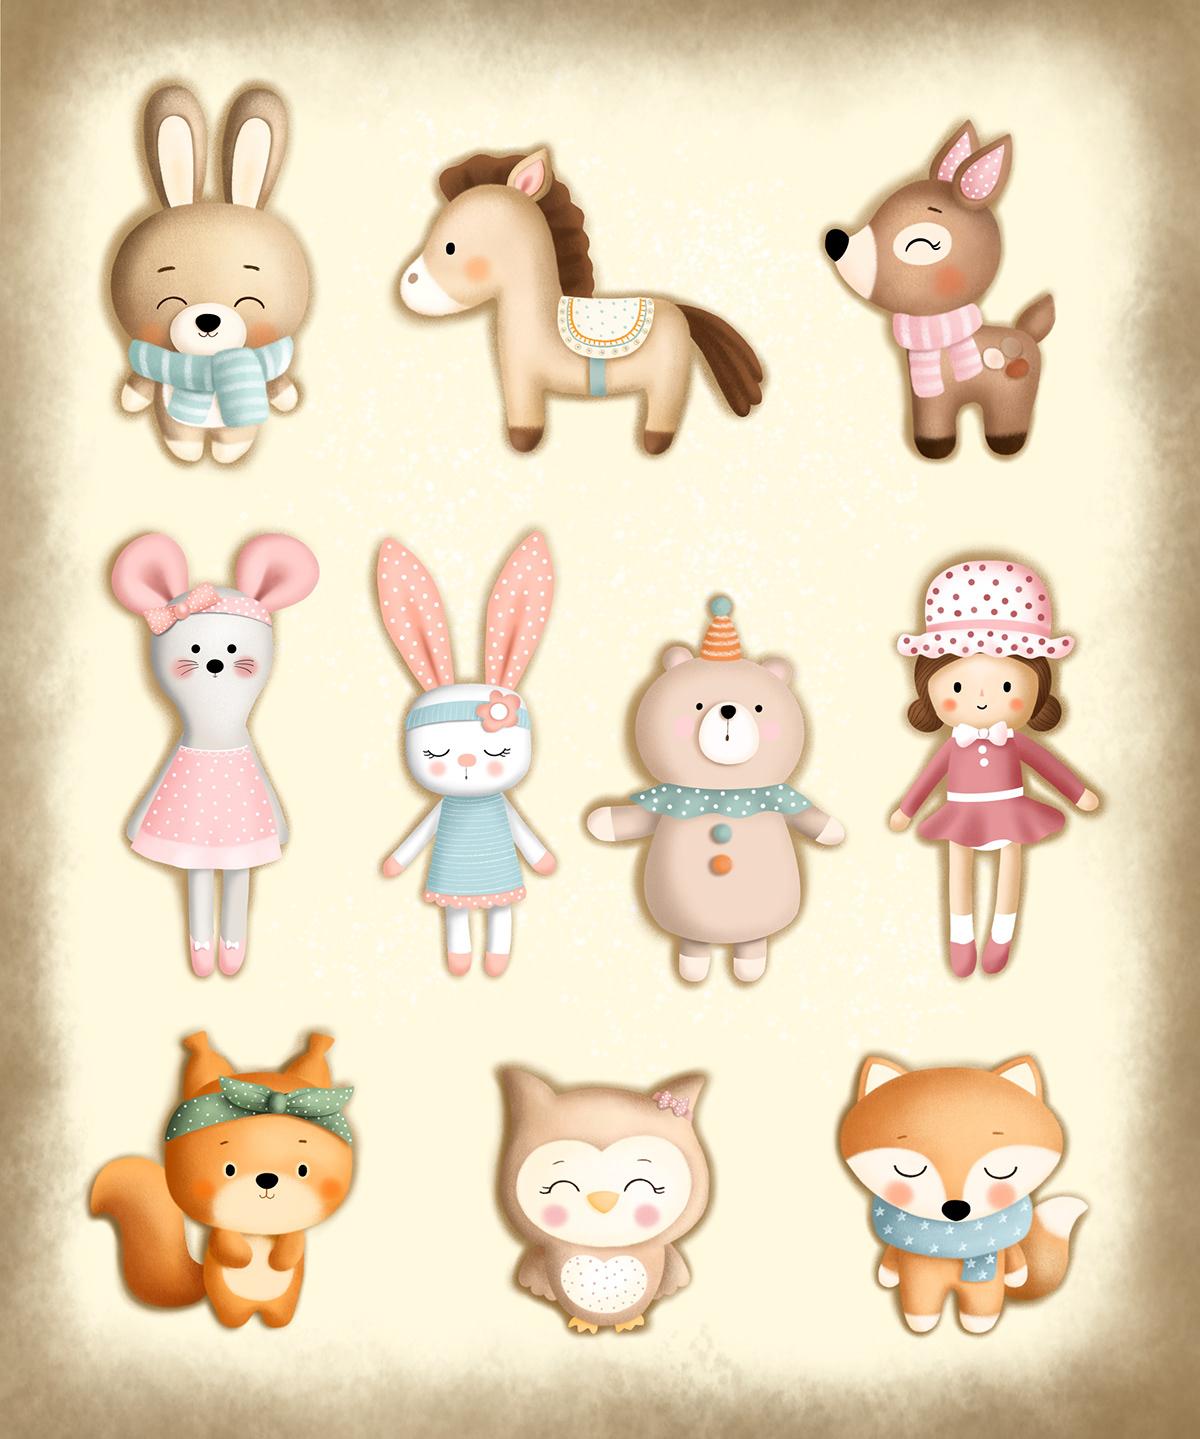 bunny children cute pig rabbit toys